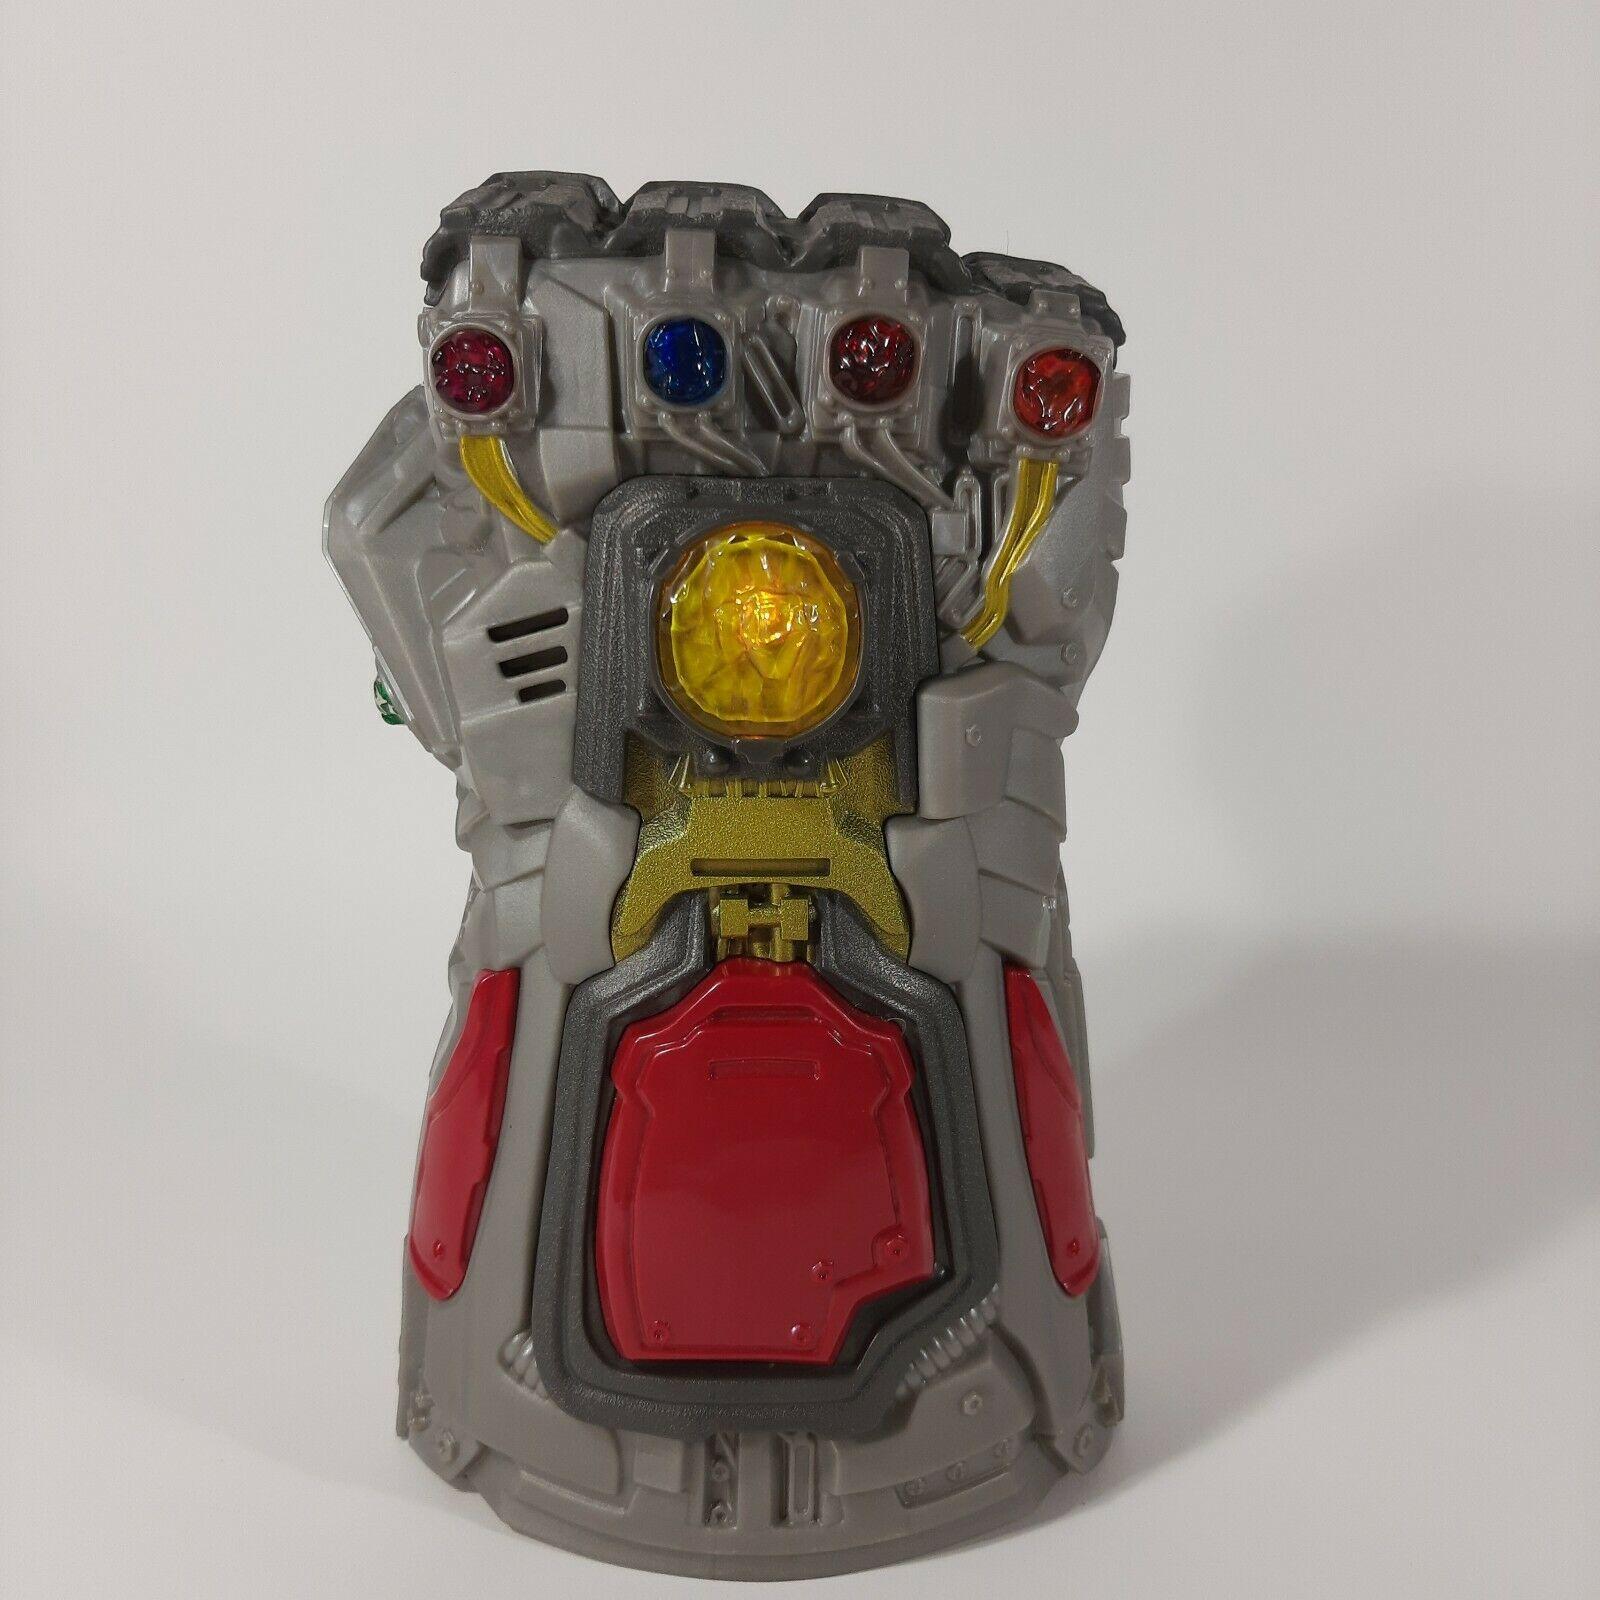 Marvel Avengers: Endgame Electronic Thanos Gauntlet Fist Roleplay Toy Hasbro - $14.03